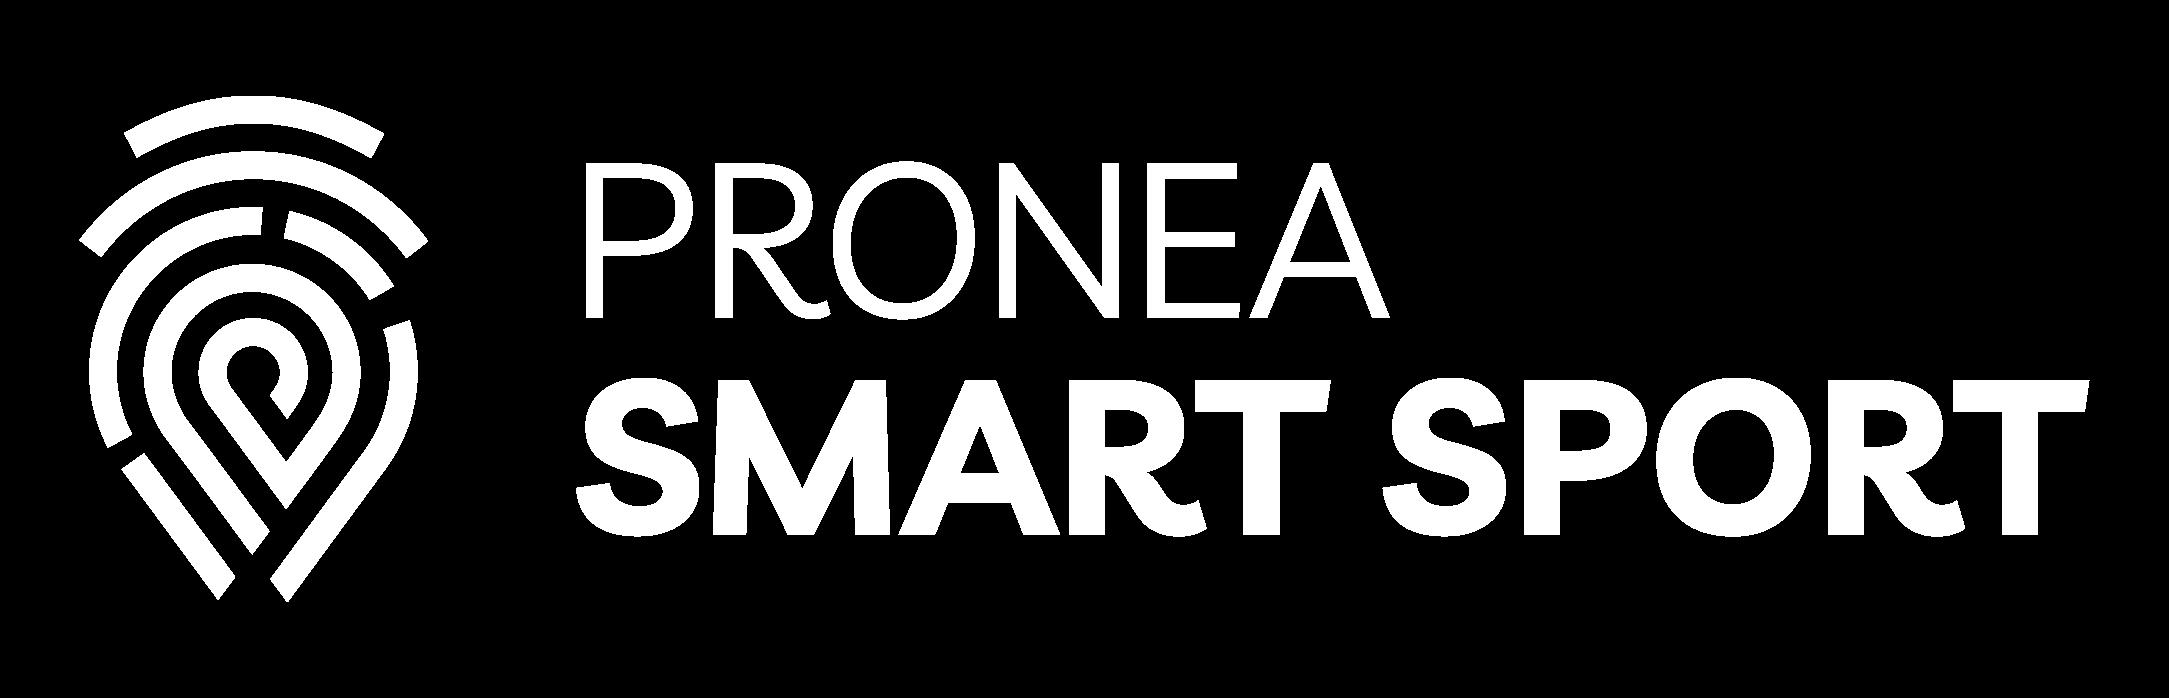 Pronea Smart Sport